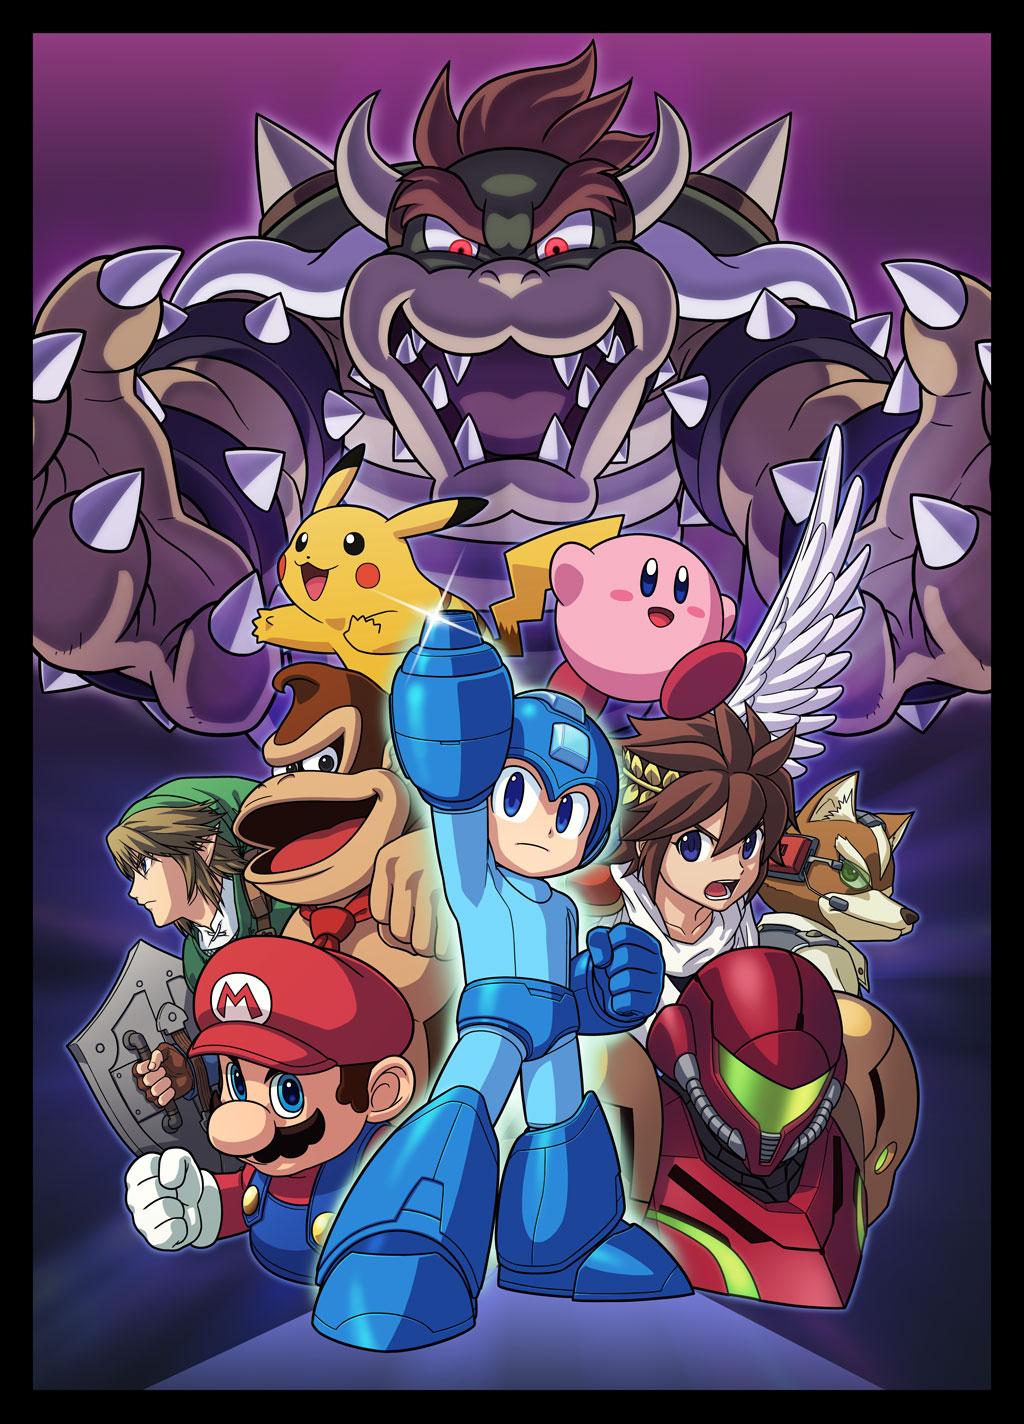 WiiU-3DS_SmashBros_illuNew02_E3